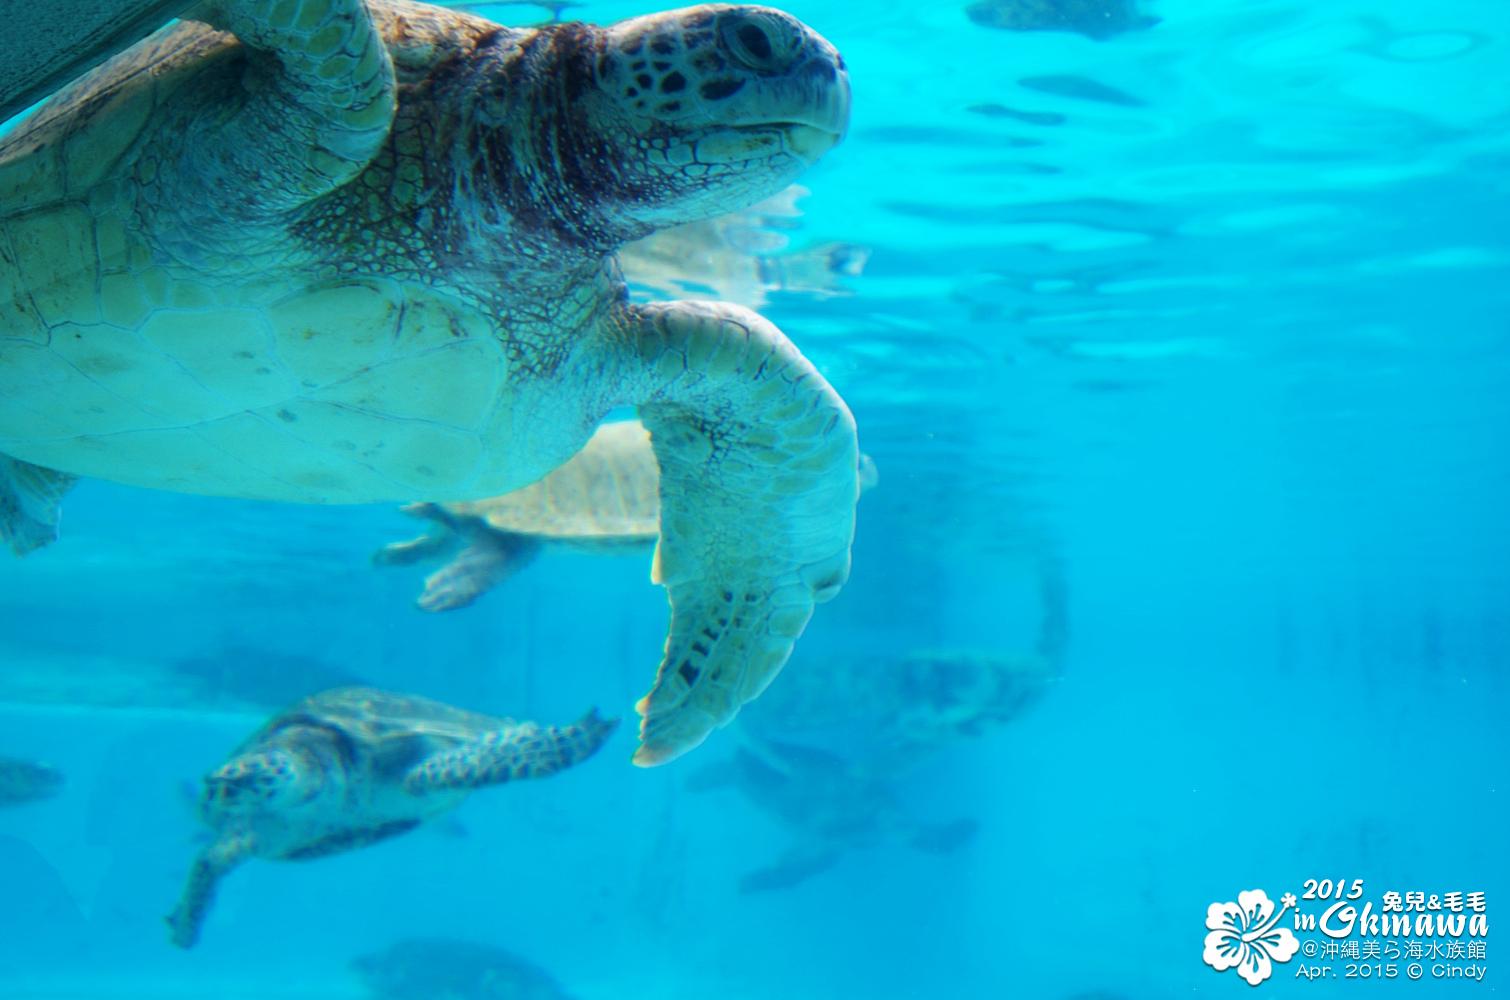 2015-0405-沖縄美ら海水族館-43